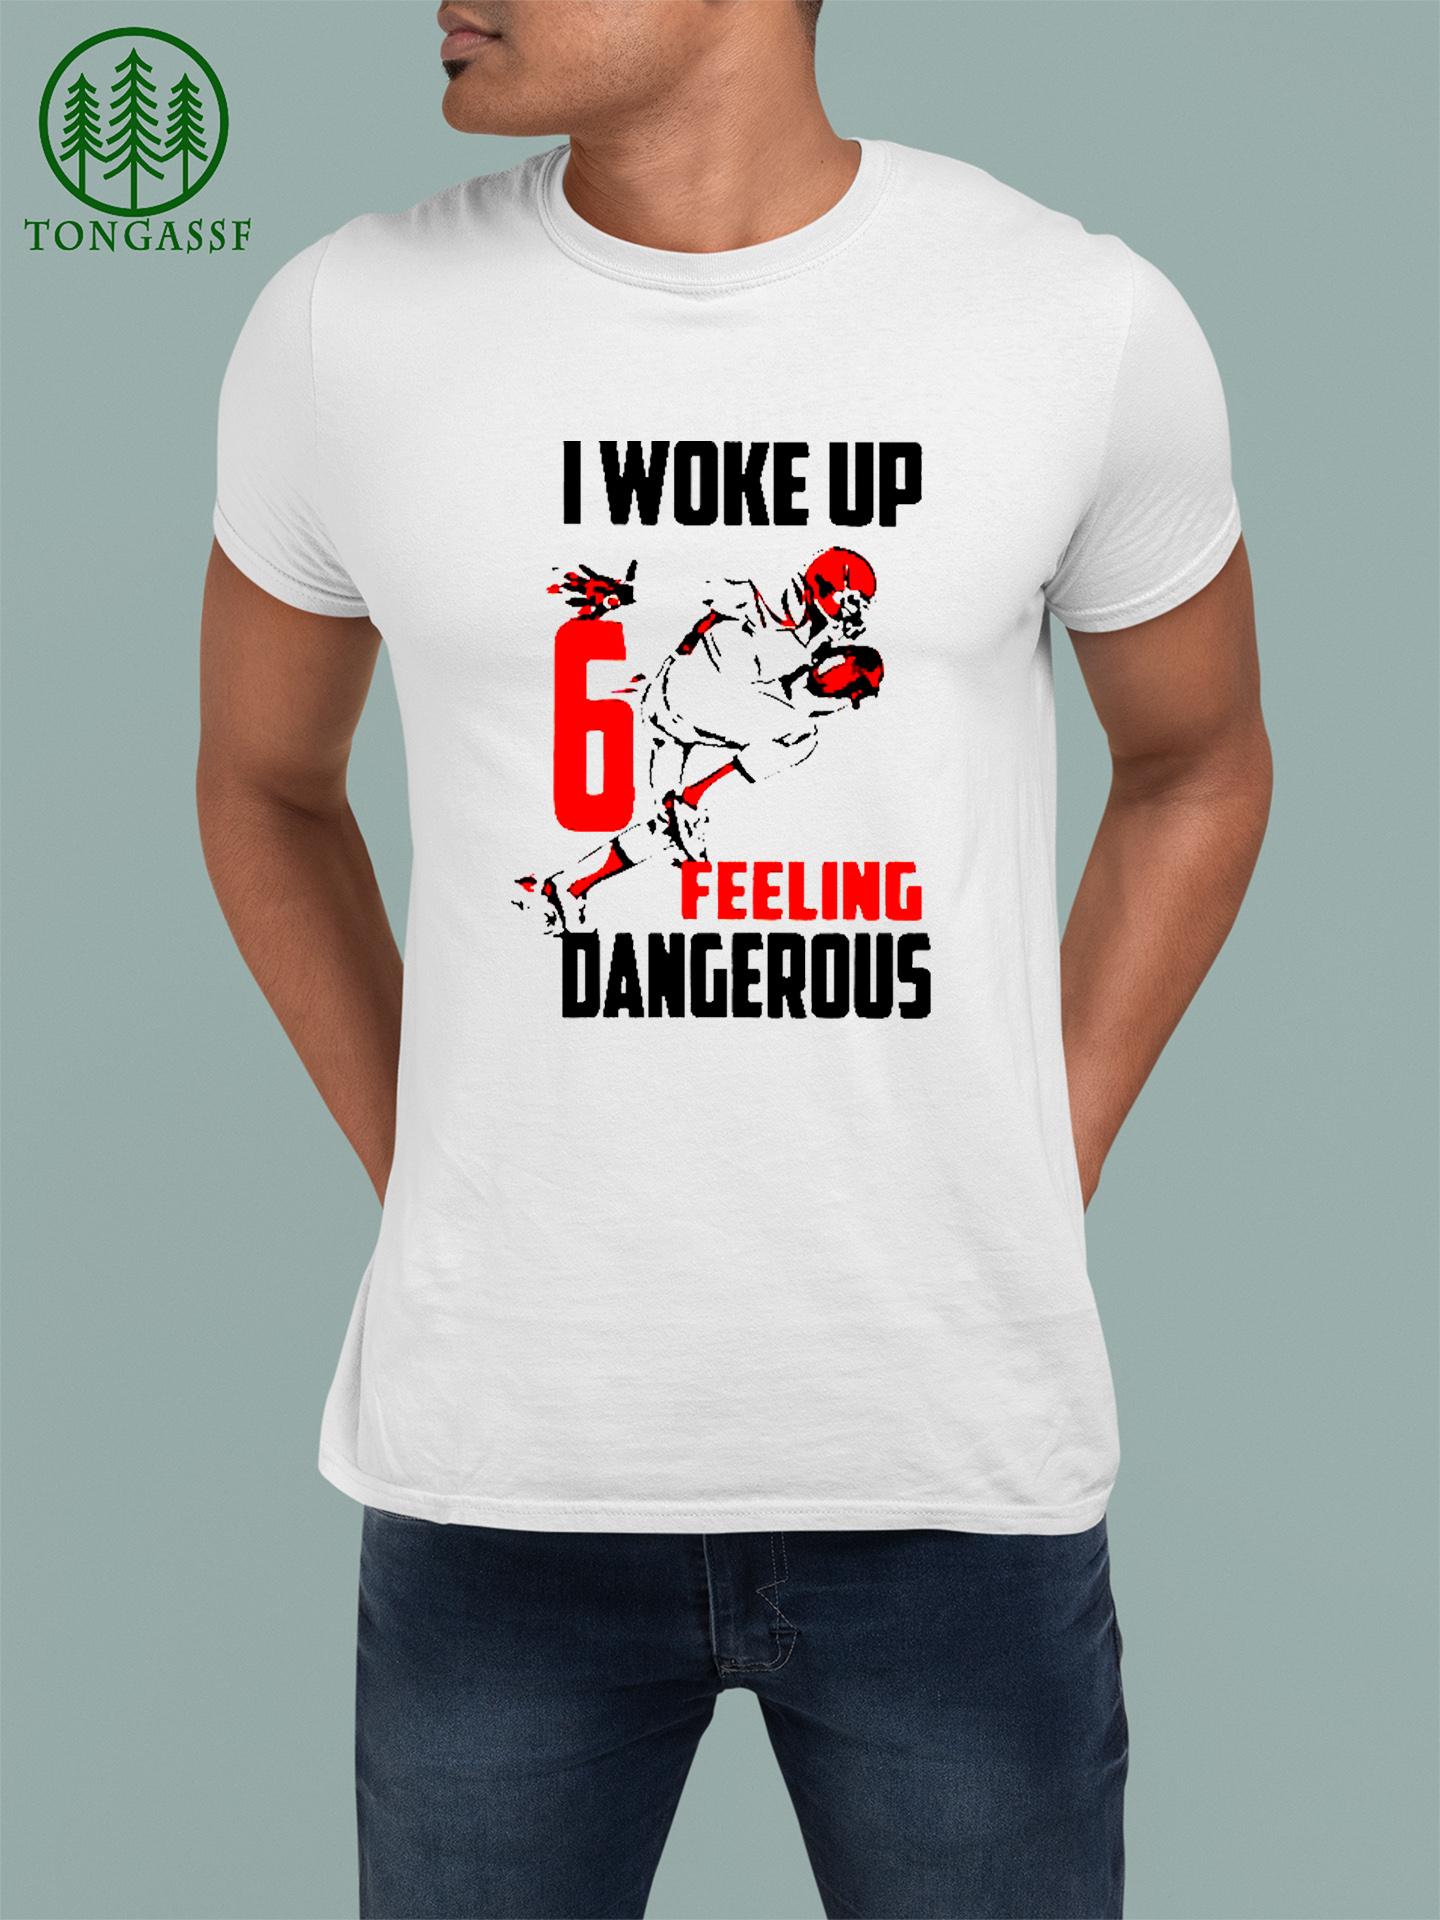 Baker Mayfield No 6 I Woke Up Feeling Dangerous t shirt